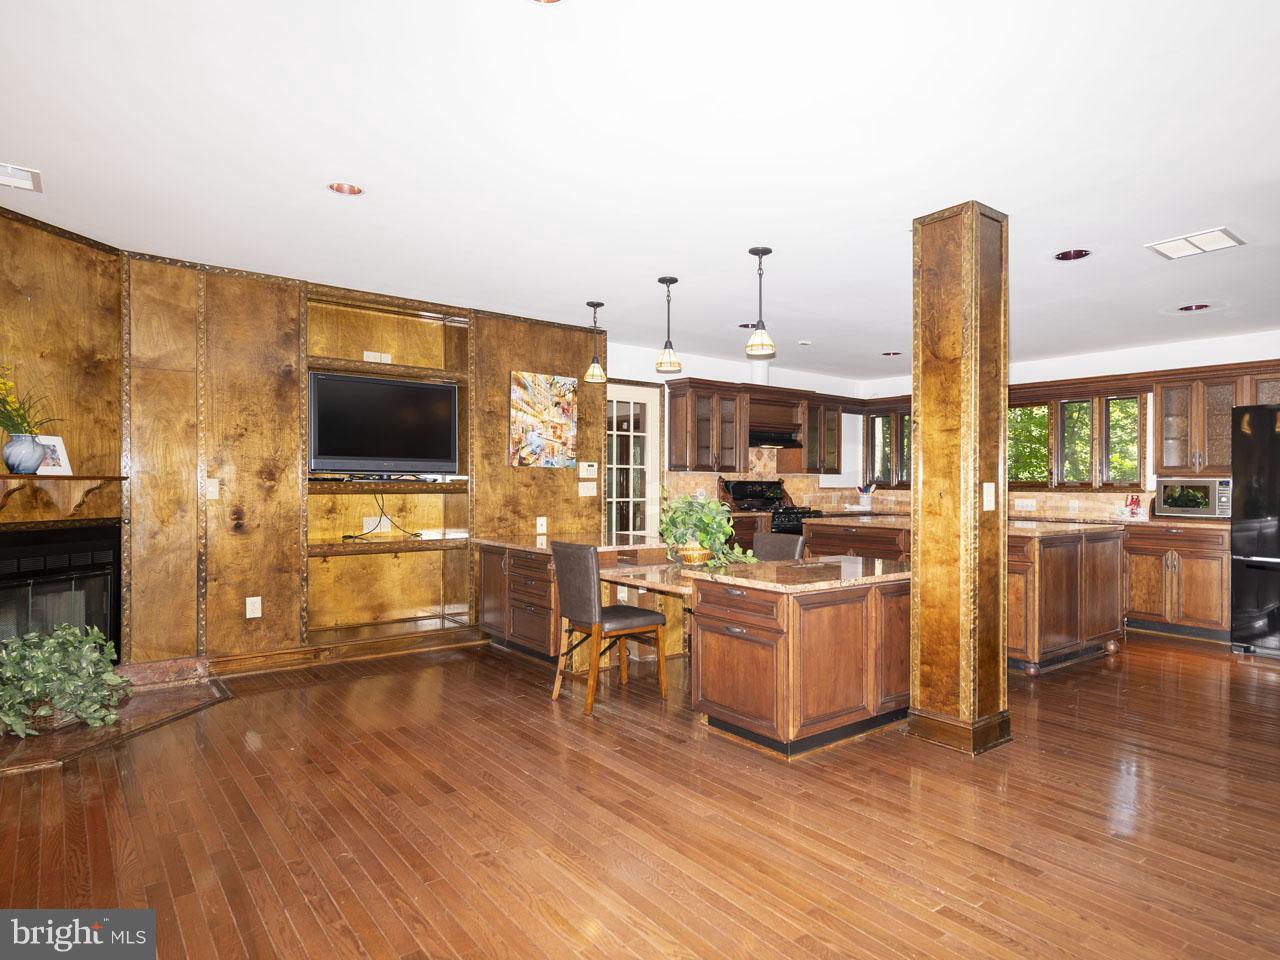 1002303700-300502417944-2021-07-22-03-27-23  |   | Alexandria Delaware Real Estate For Sale | MLS# 1002303700  - Best of Northern Virginia